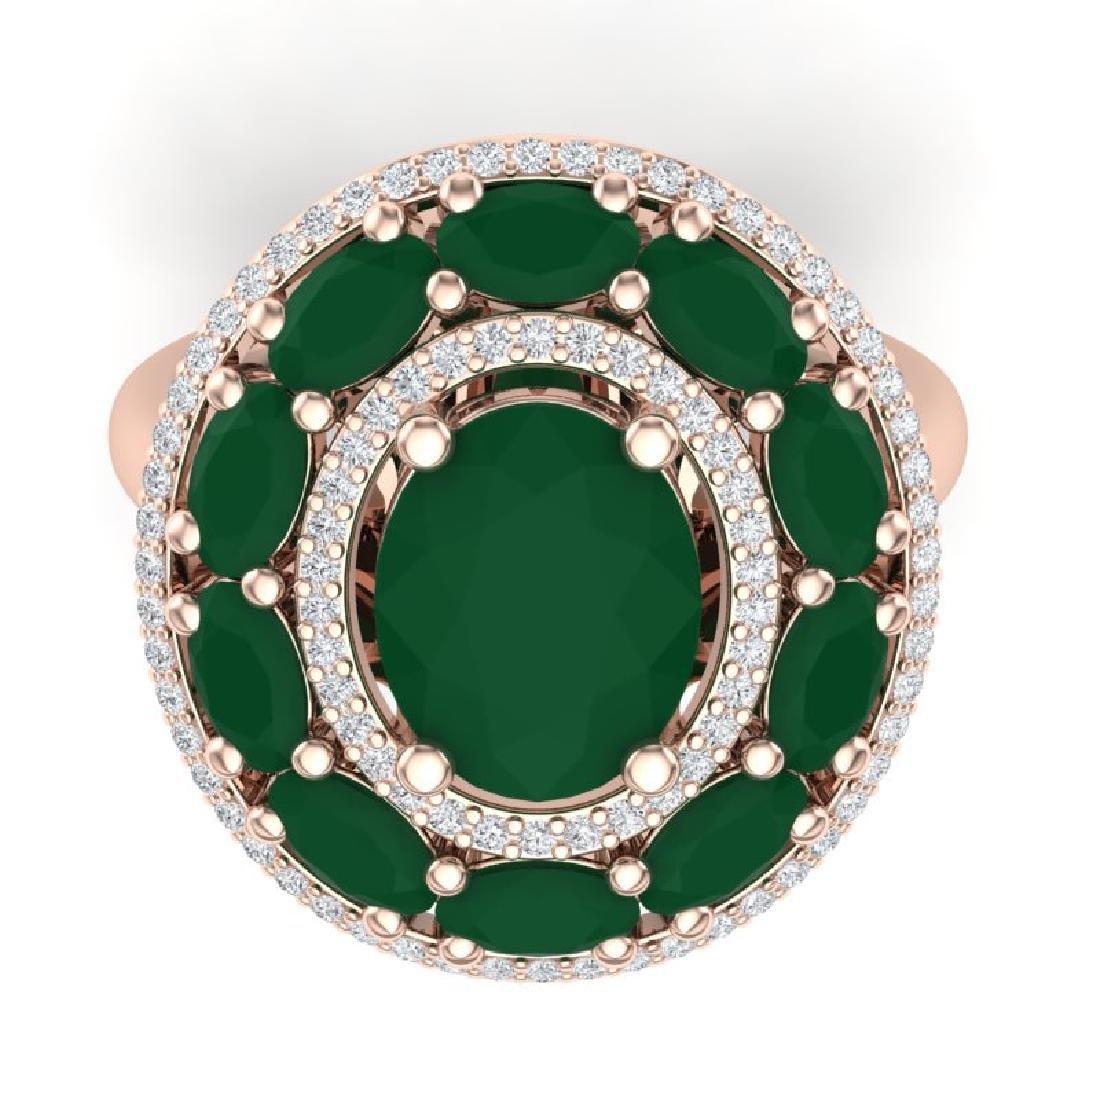 8.05 CTW Royalty Designer Emerald & VS Diamond Ring 18K - 2